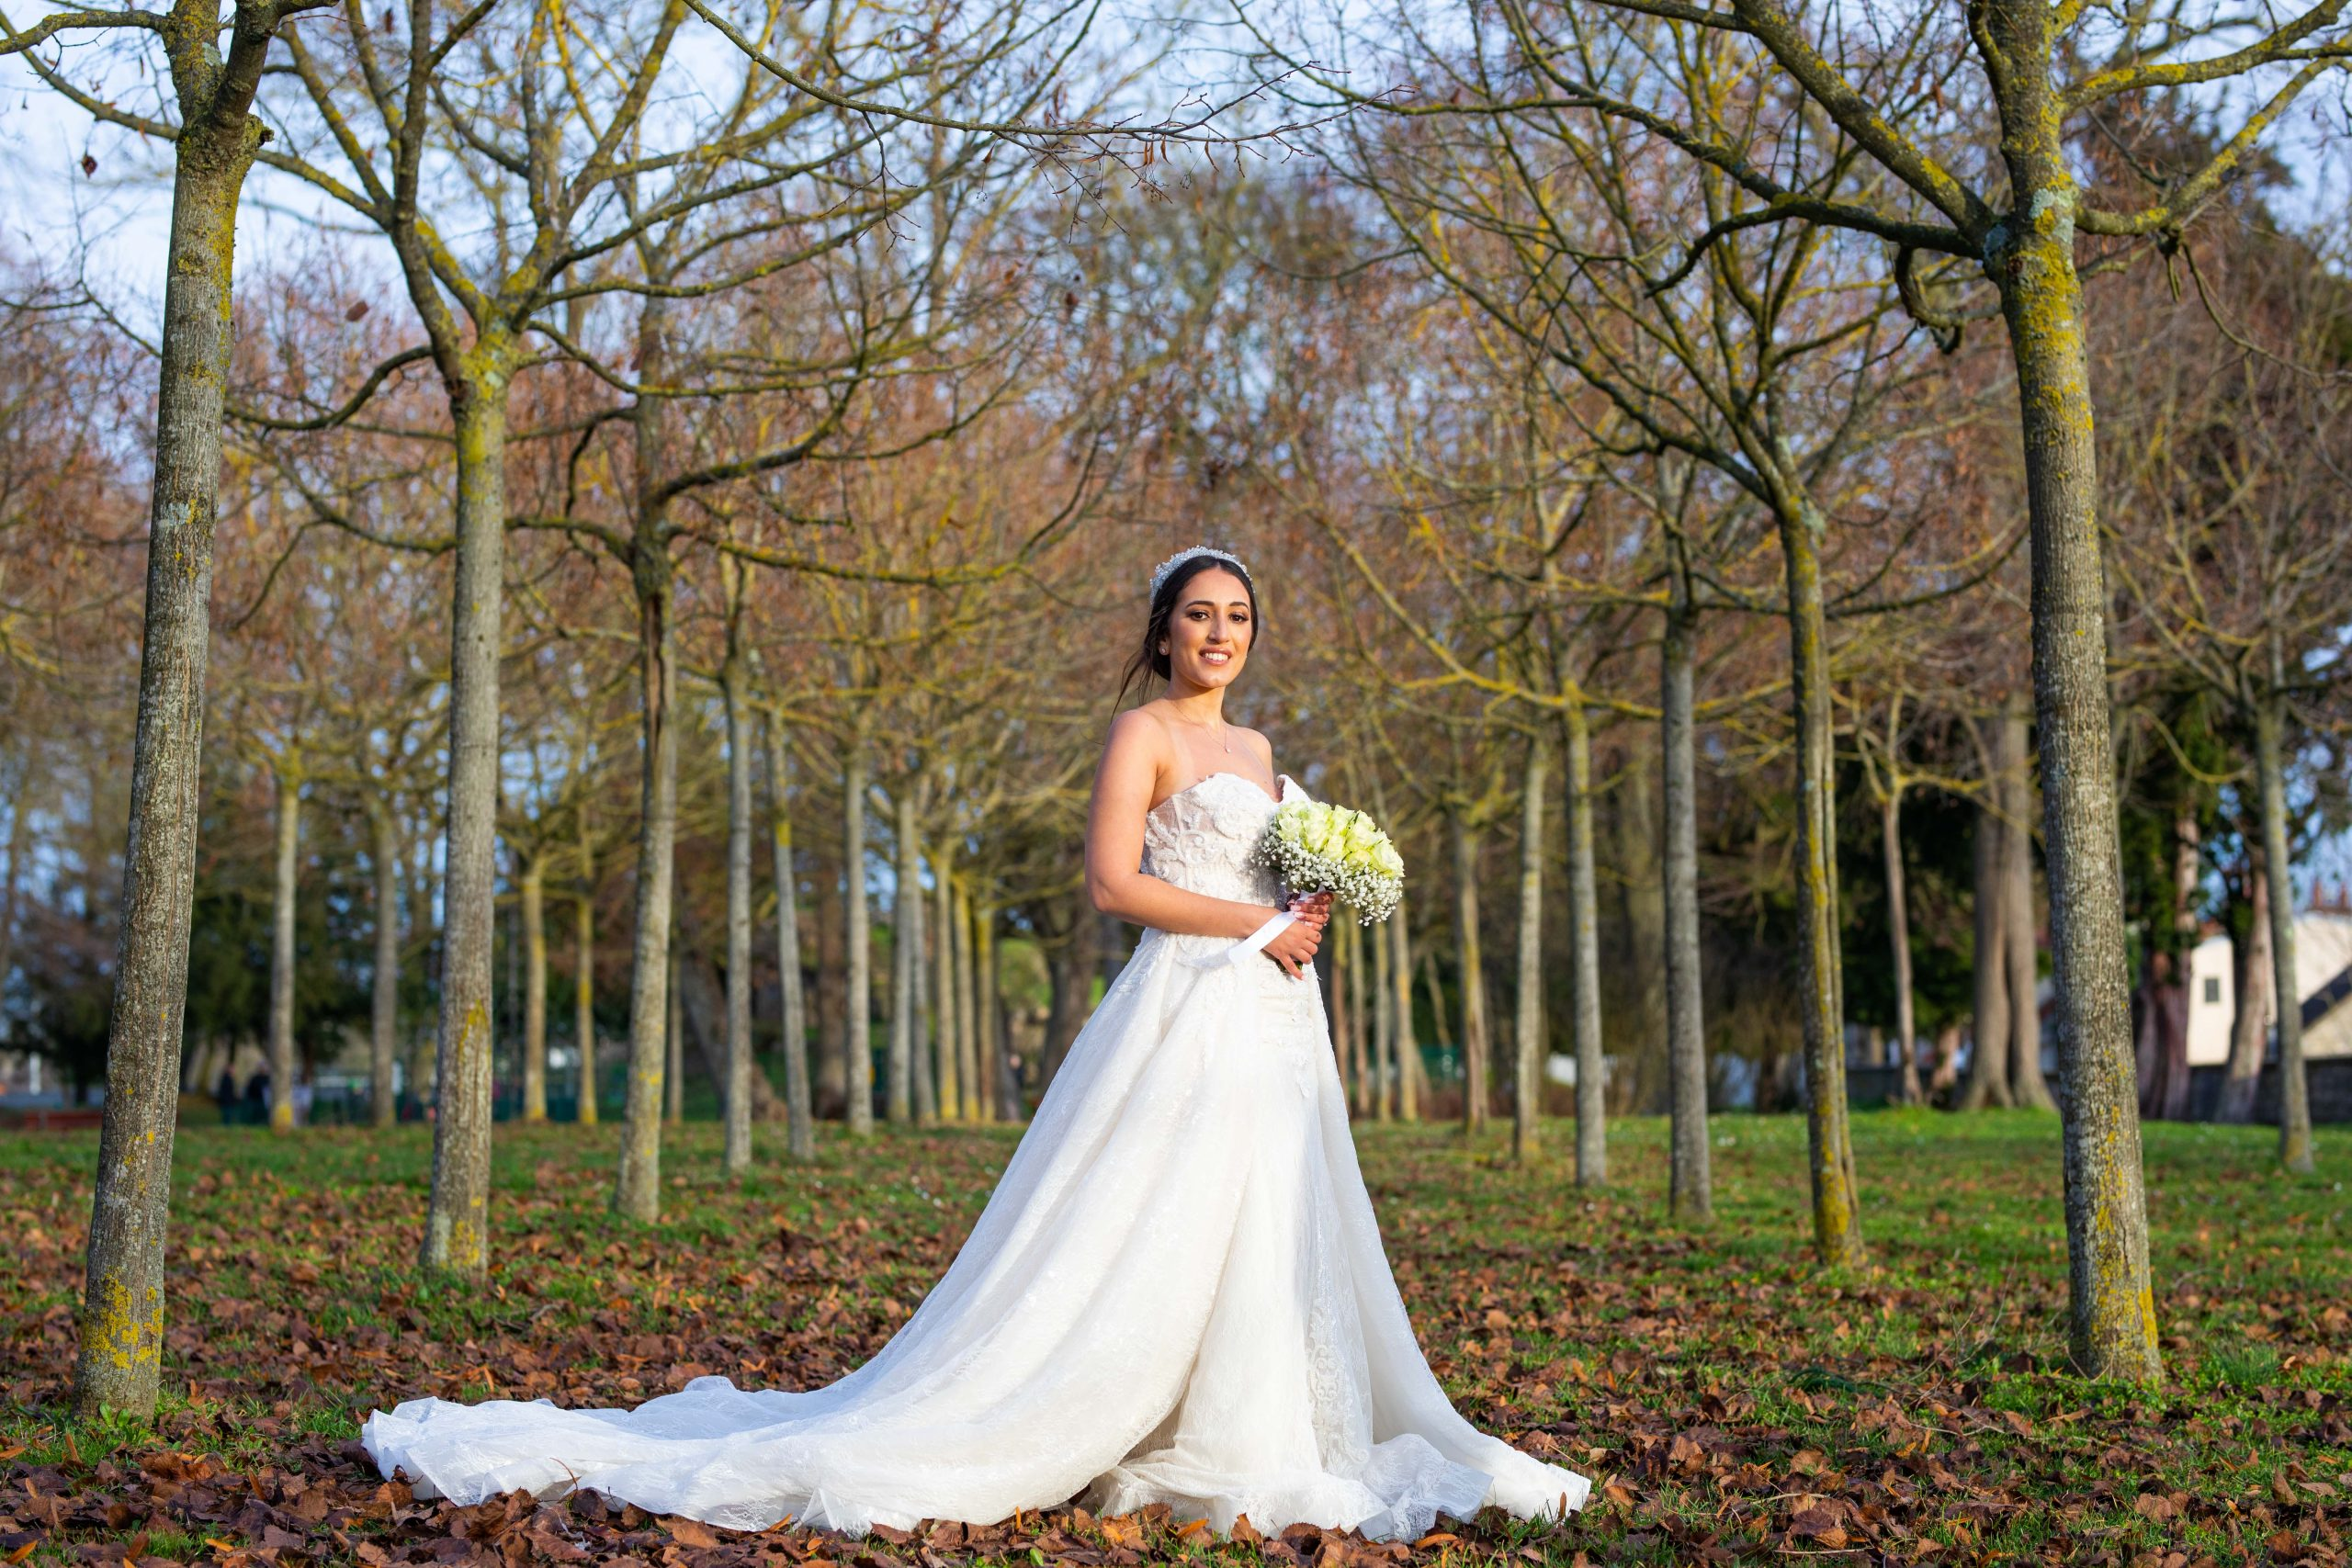 Photographe mariage France - Séance couple automne - Photographe mariage- Paris- Montpellier - Nice -original - mariage intime -